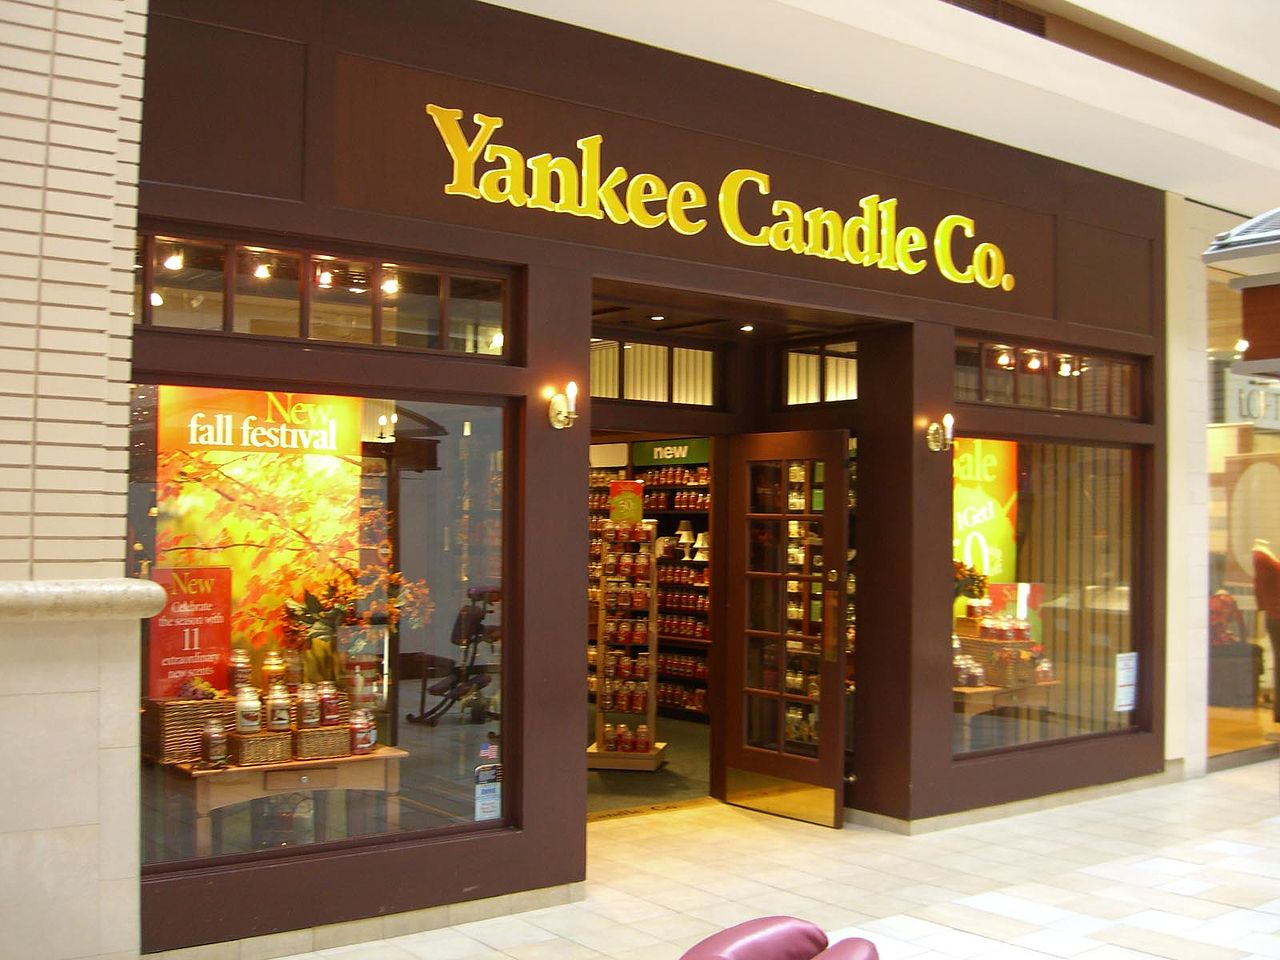 The Yankee Candle phenomenon